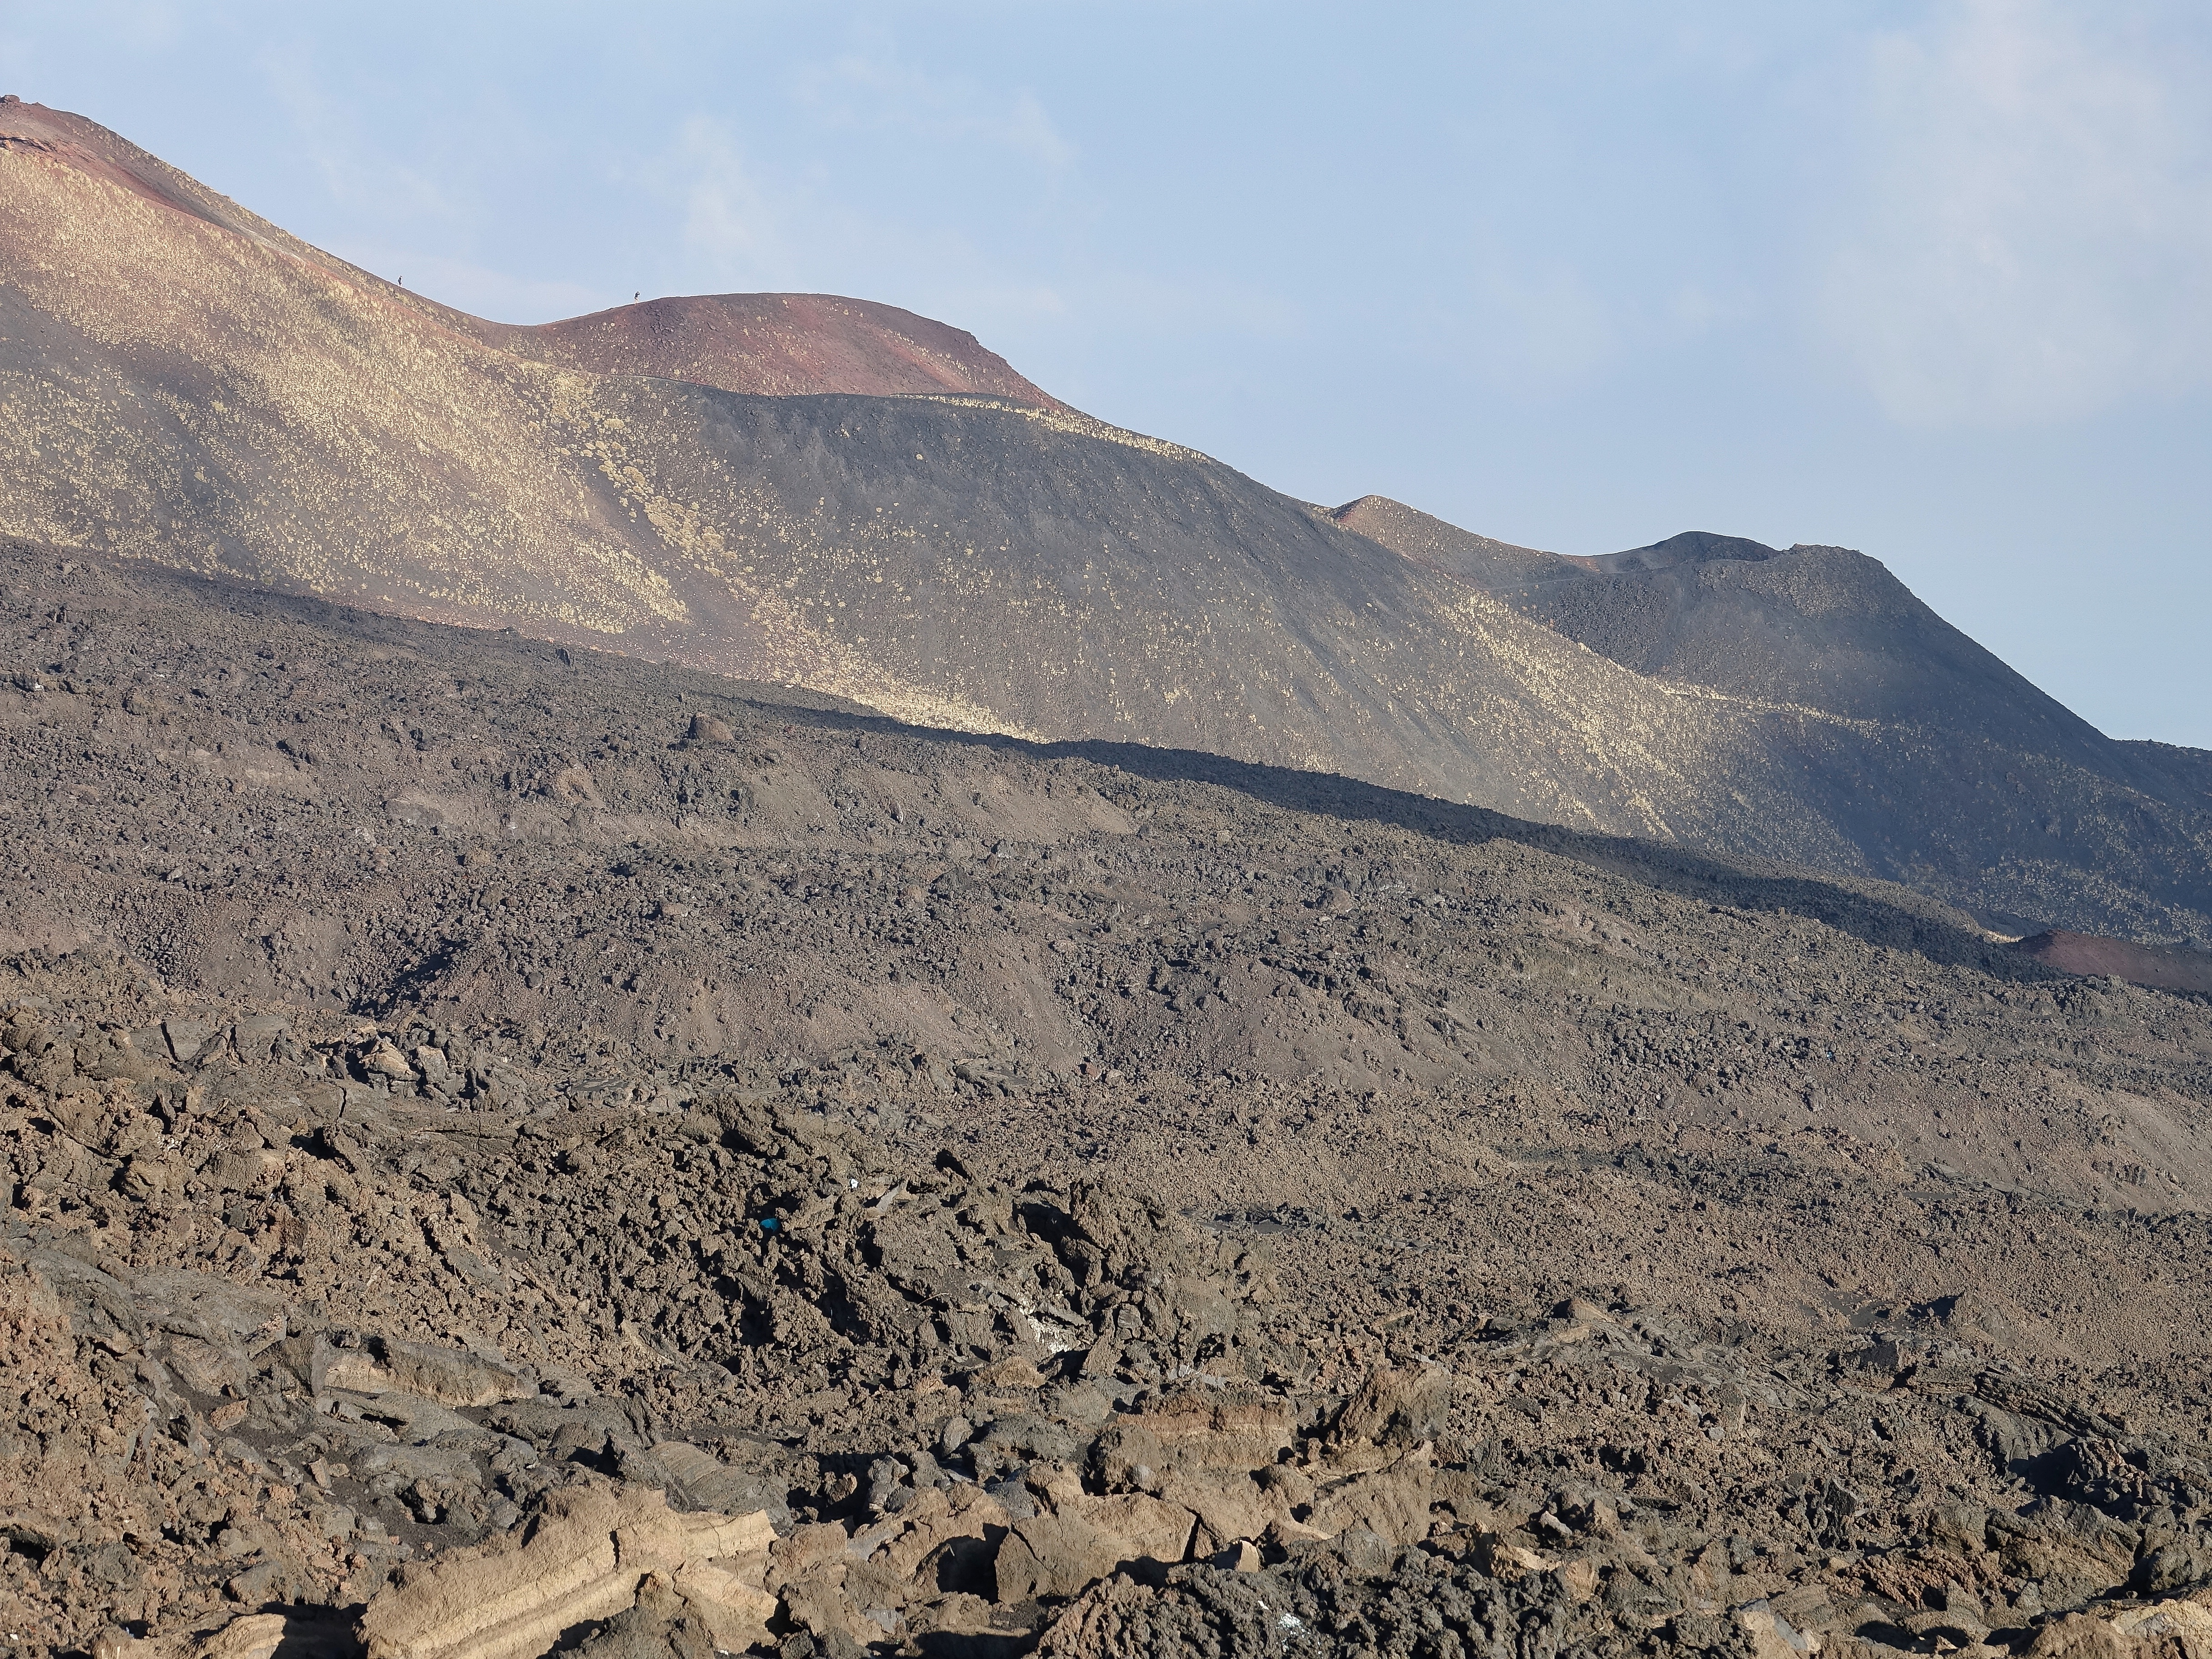 Barren, moonscape of lava rocks